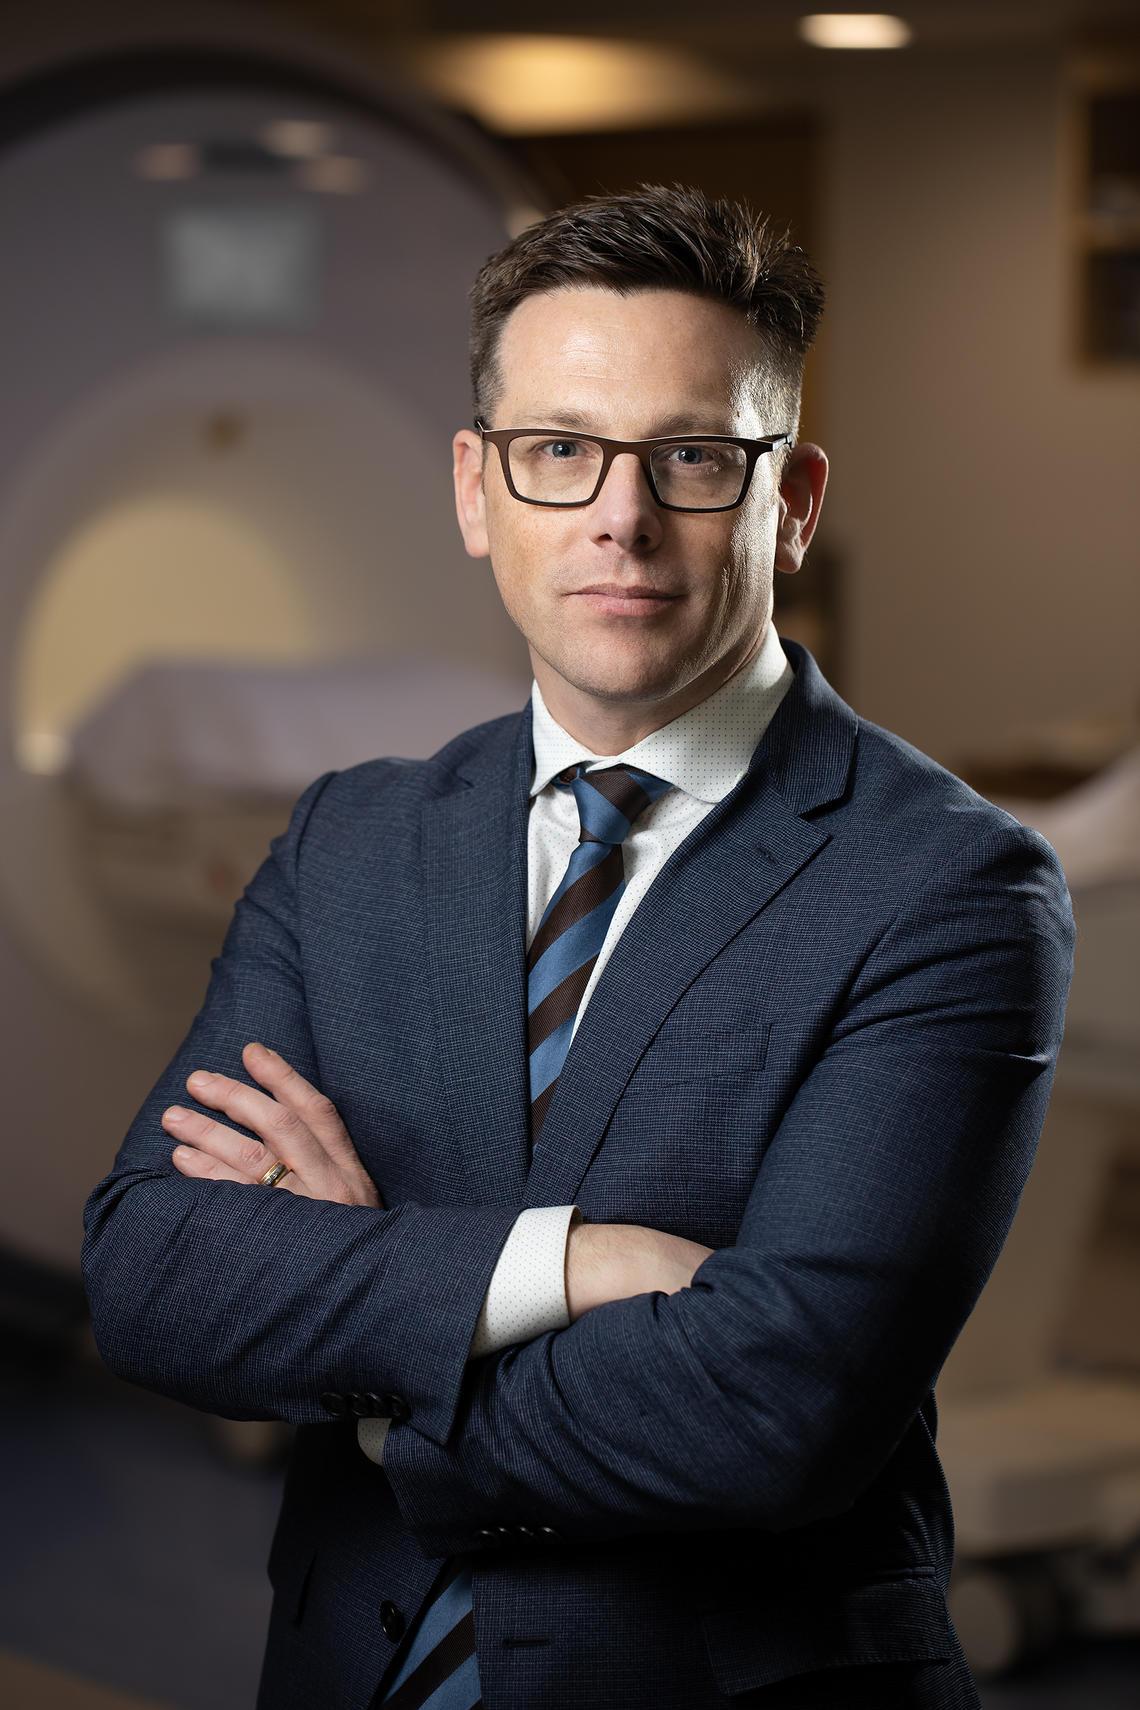 Dr. James White, MD, PhD